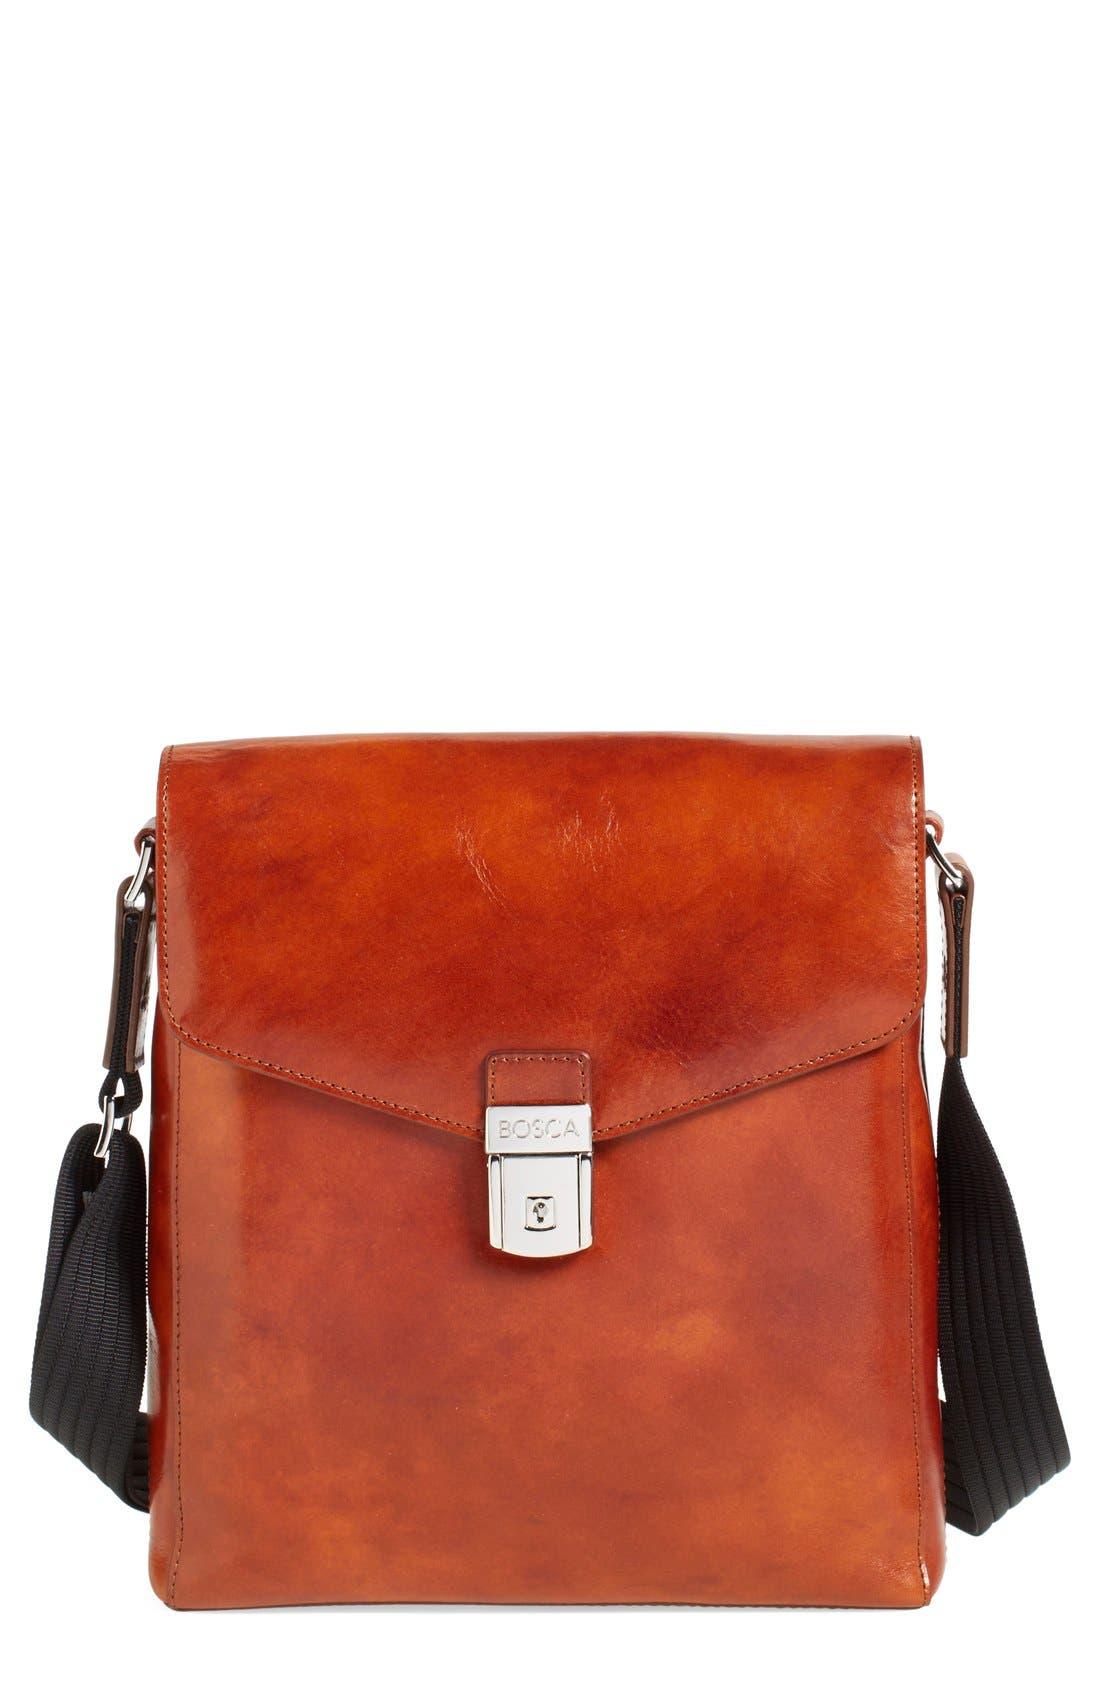 'Man Bag' Leather Crossbody Bag,                             Main thumbnail 1, color,                             233